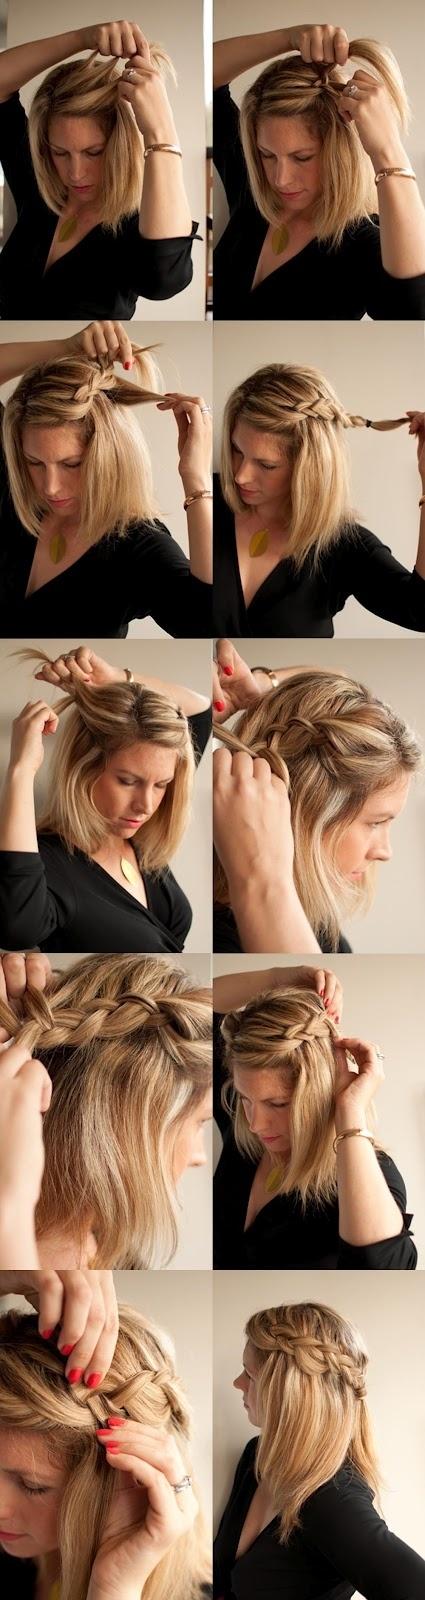 Fabulous 11 Interesting And Useful Hair Tutorials For Every Day Short Hairstyles Gunalazisus